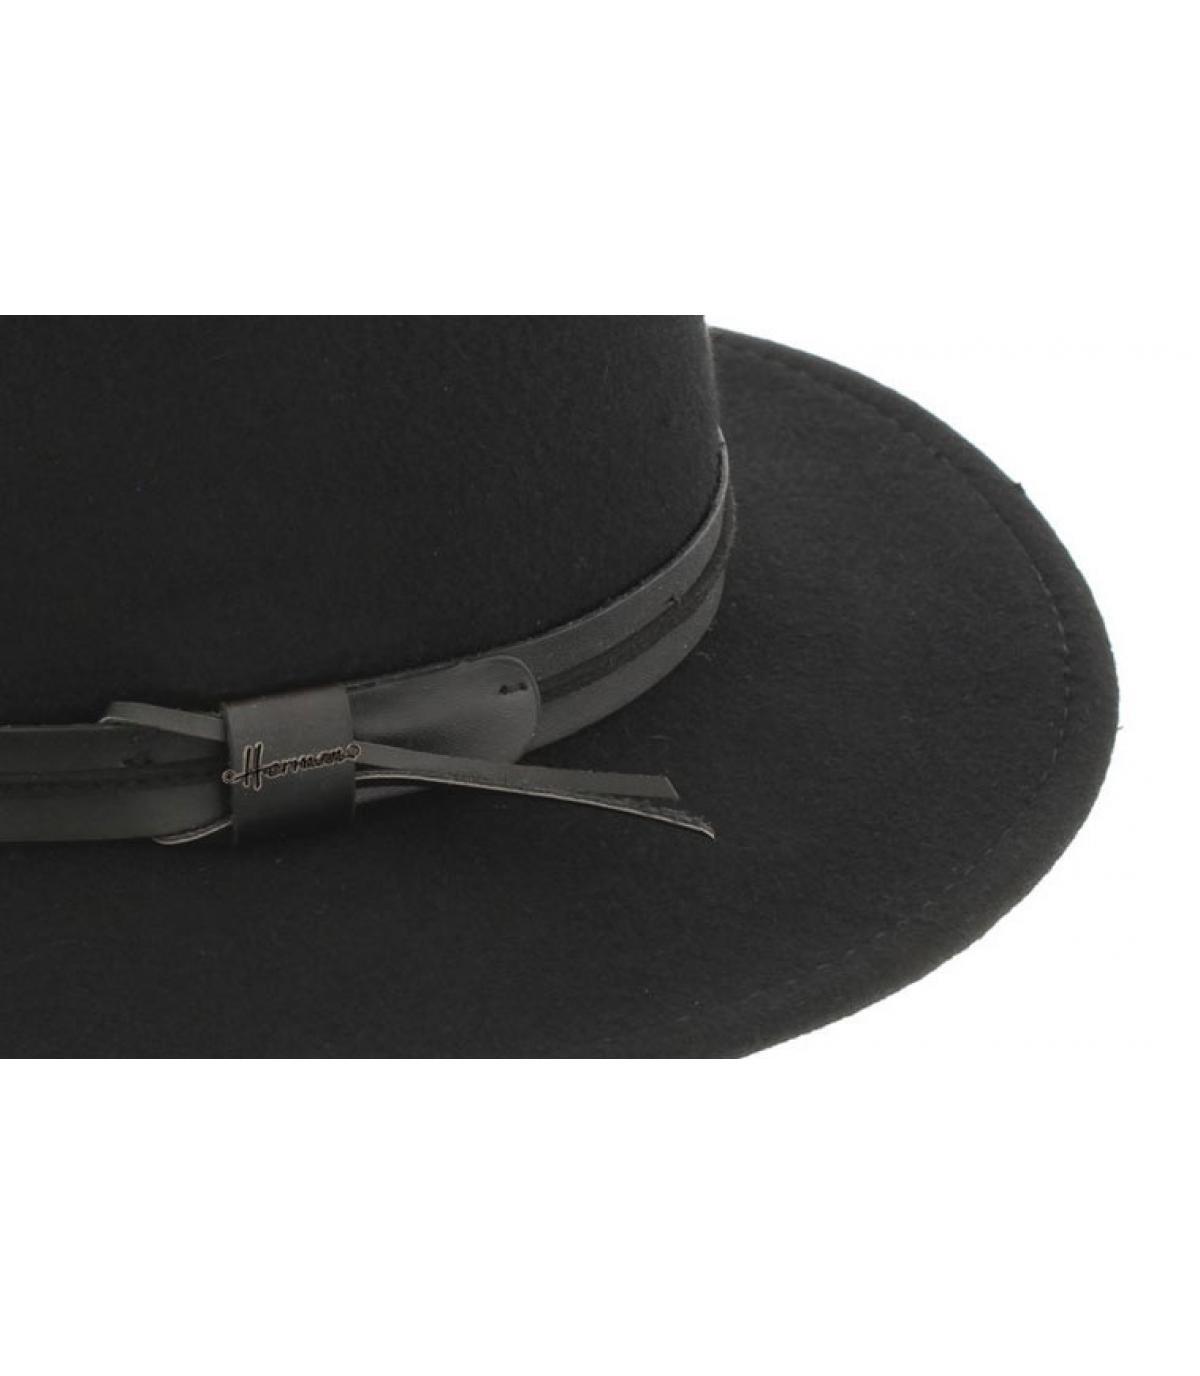 Dettagli Mackinsley black - image 3